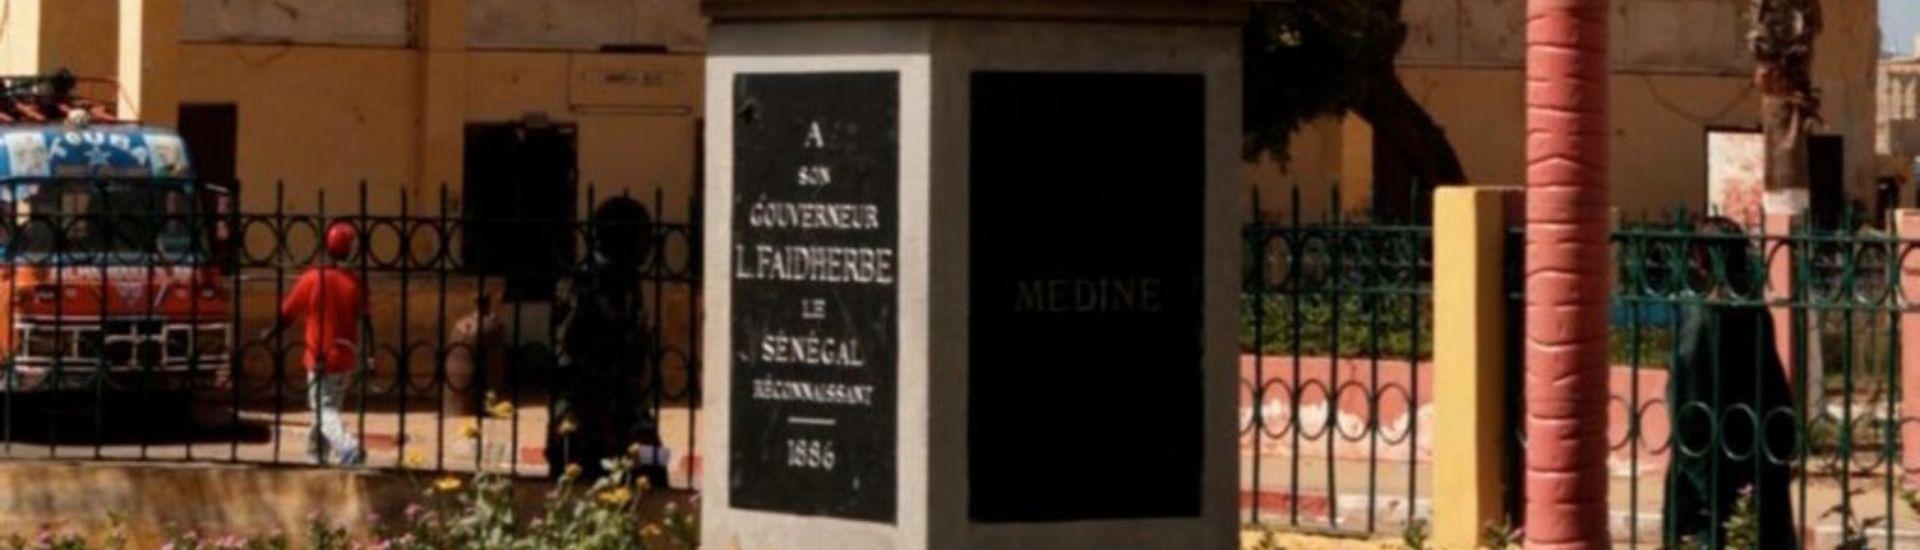 "Sénégal Saint-Louis : la place Faidherbe renommée ""Baya Ndar"""